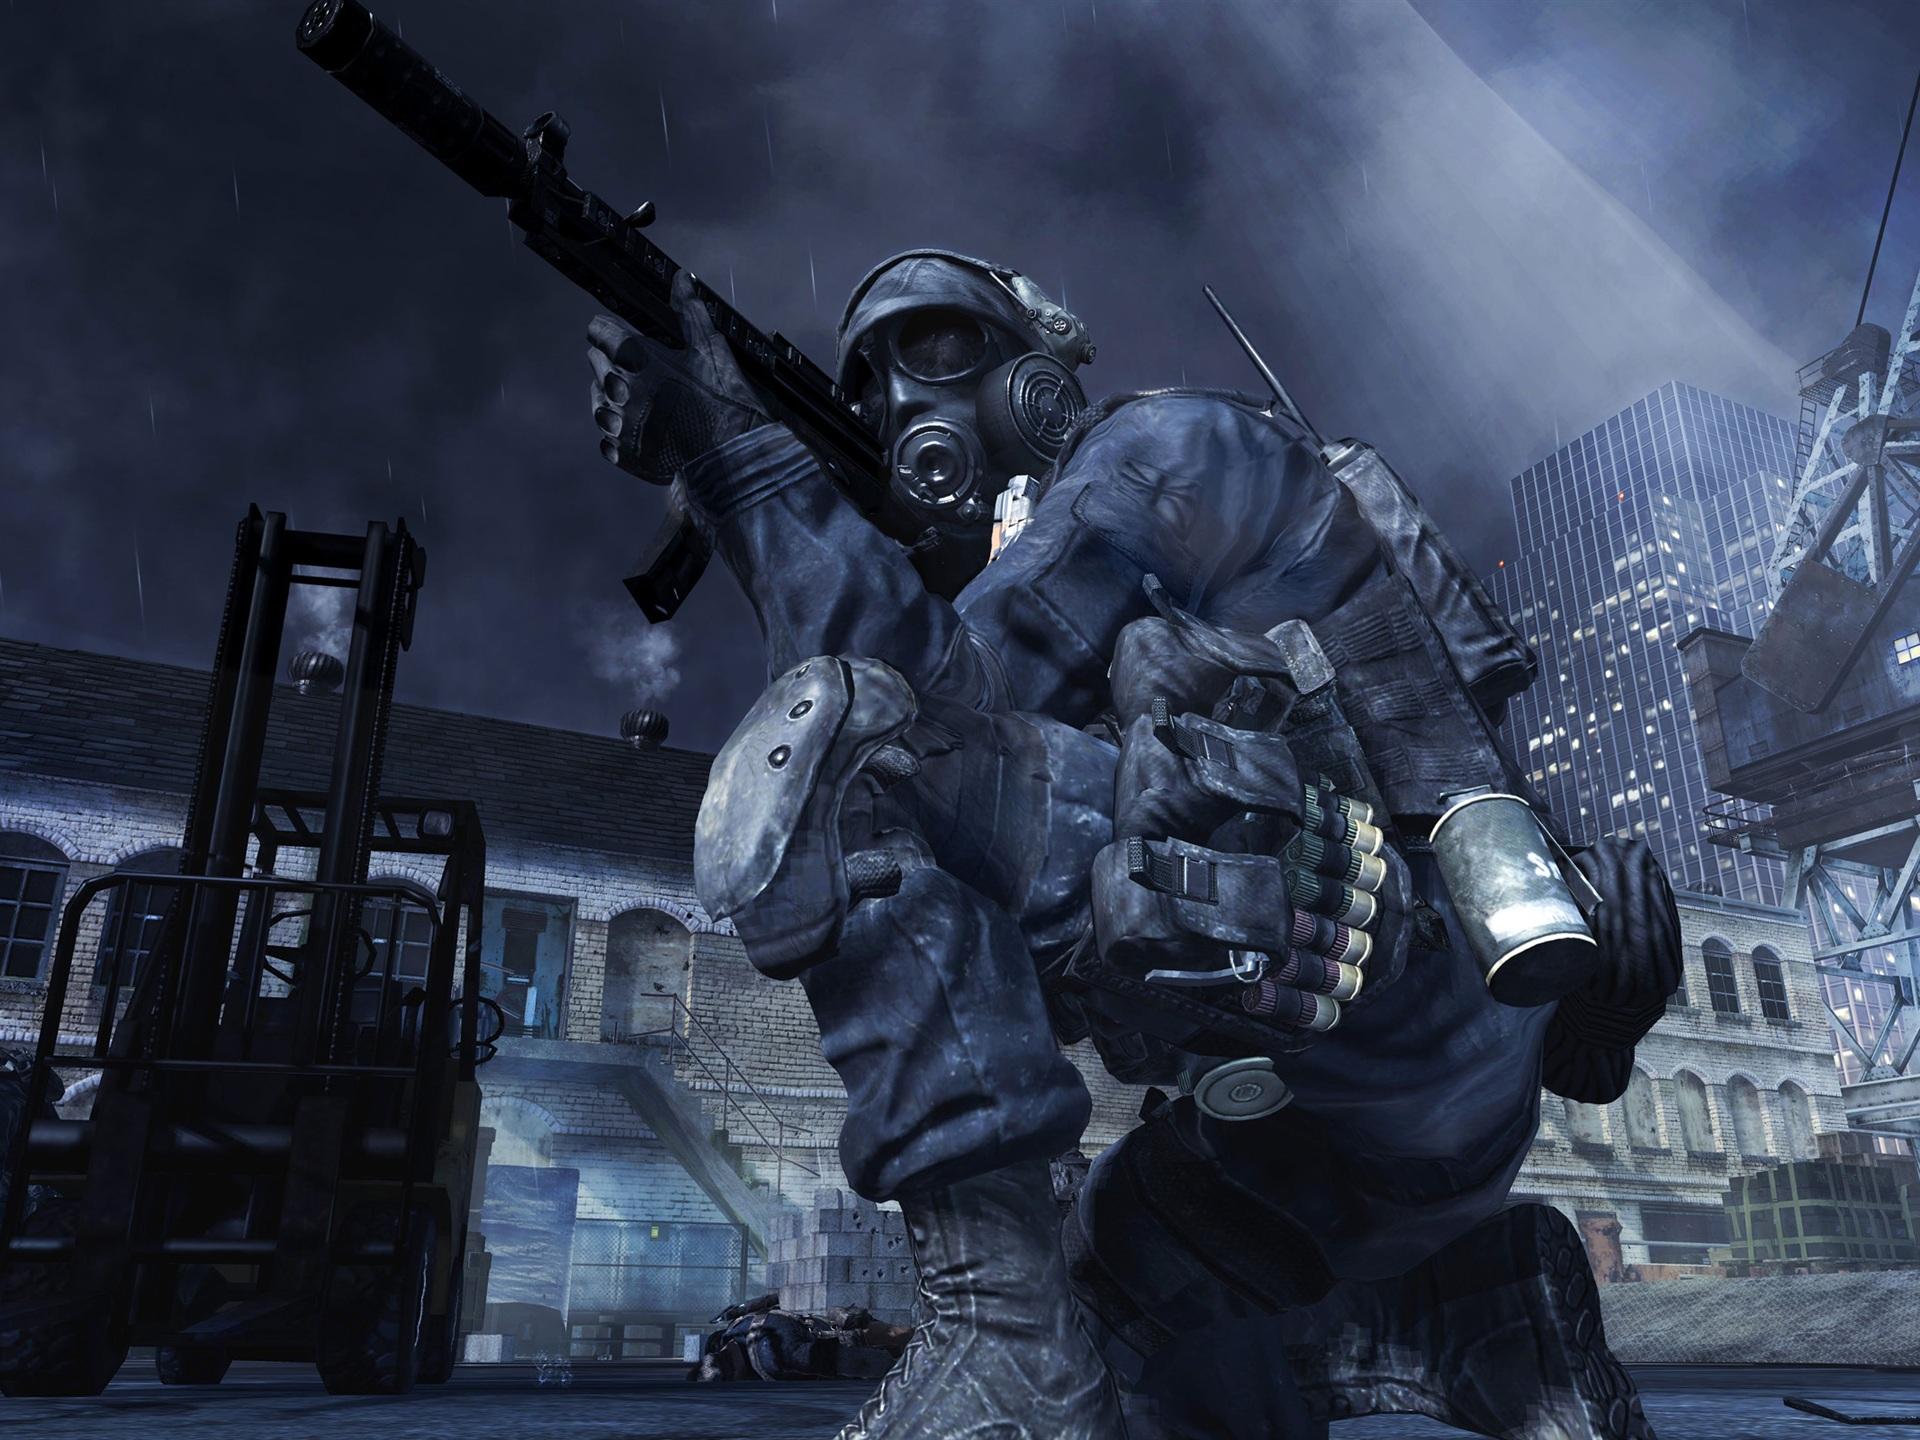 Wallpaper Call Of Duty Modern Warfare 3 HD 2560x1600 Picture Image